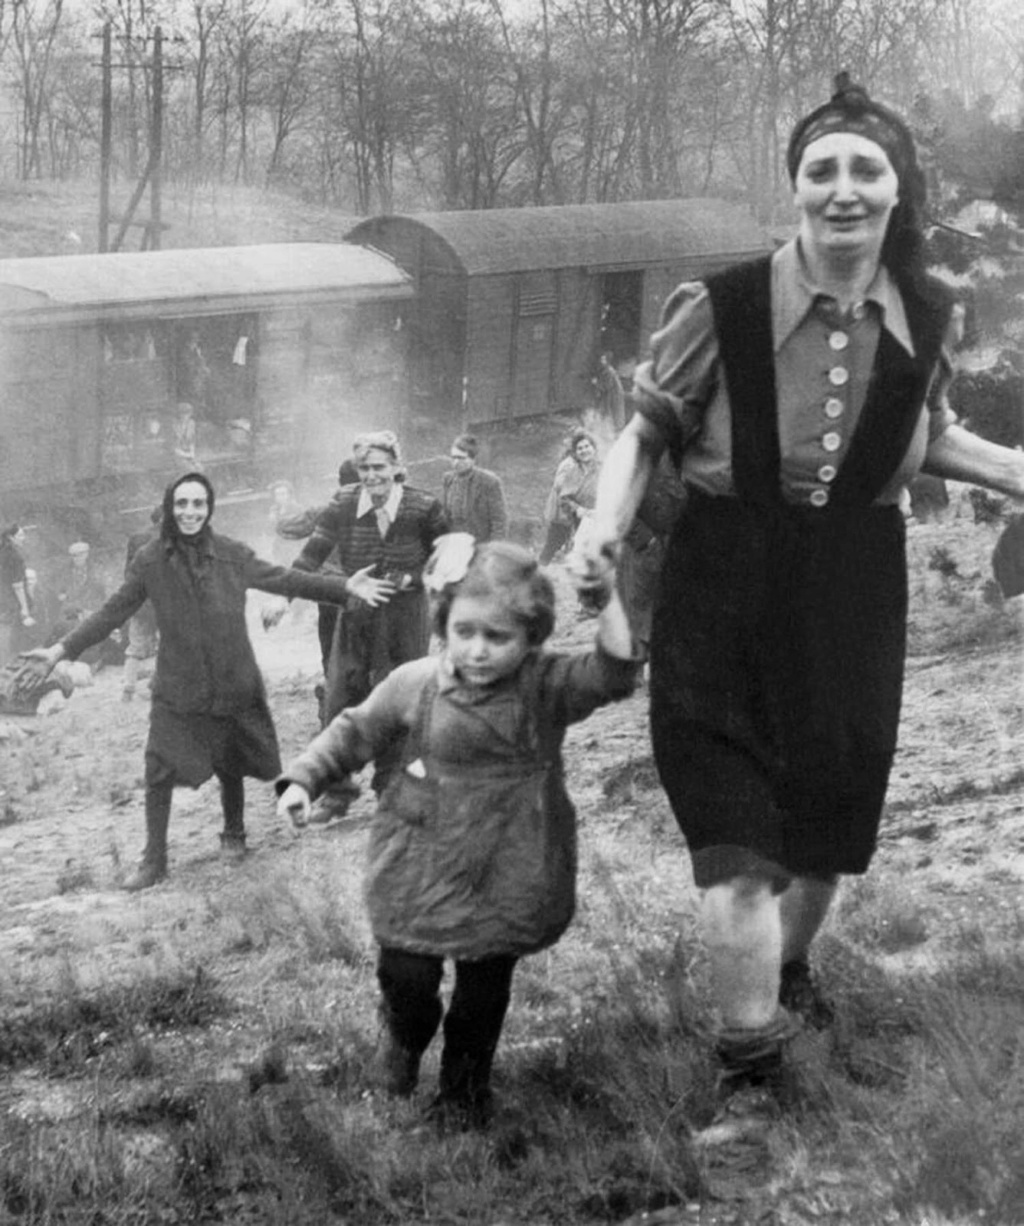 Diverses photos de la WWII - Page 40 94112